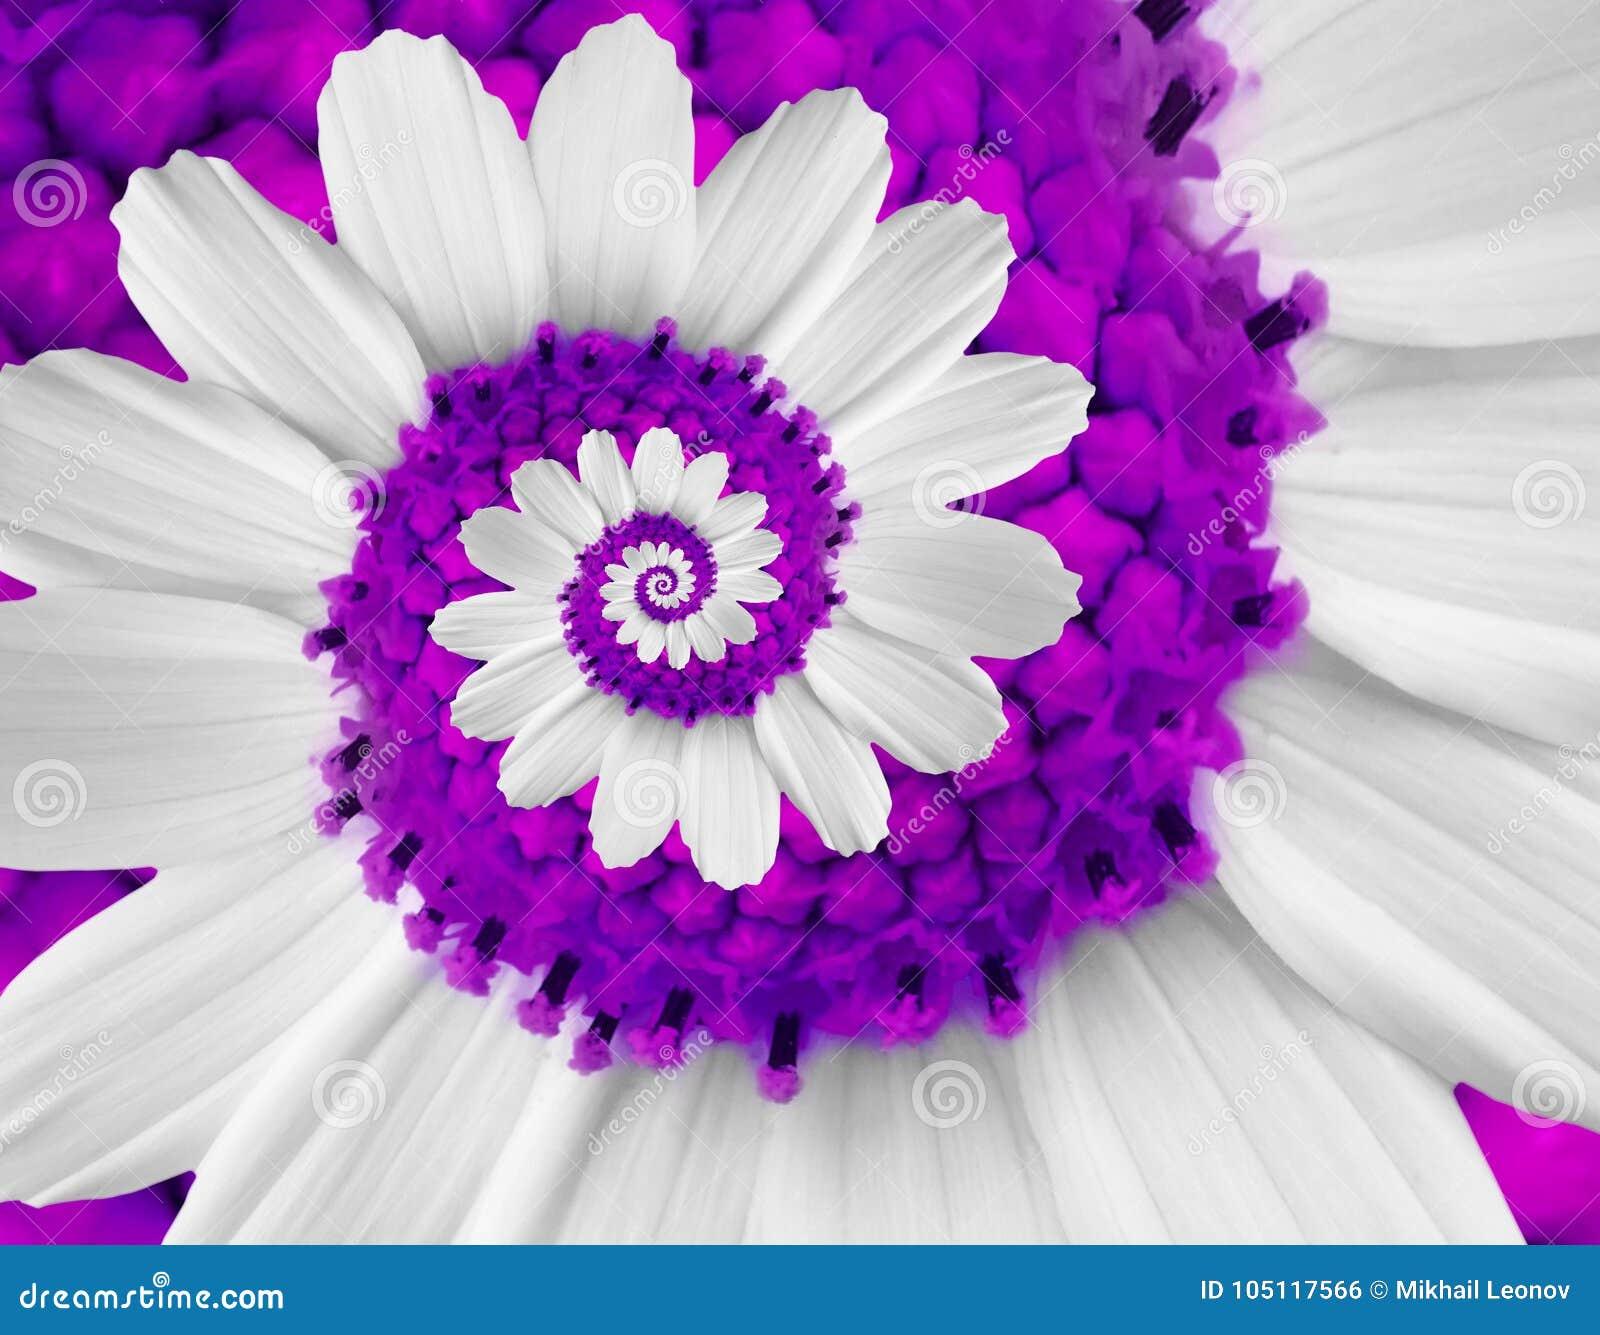 Fractal Black Flower Free Stock Photo: White Violet Camomile Daisy Cosmos Kosmeya Flower Spiral